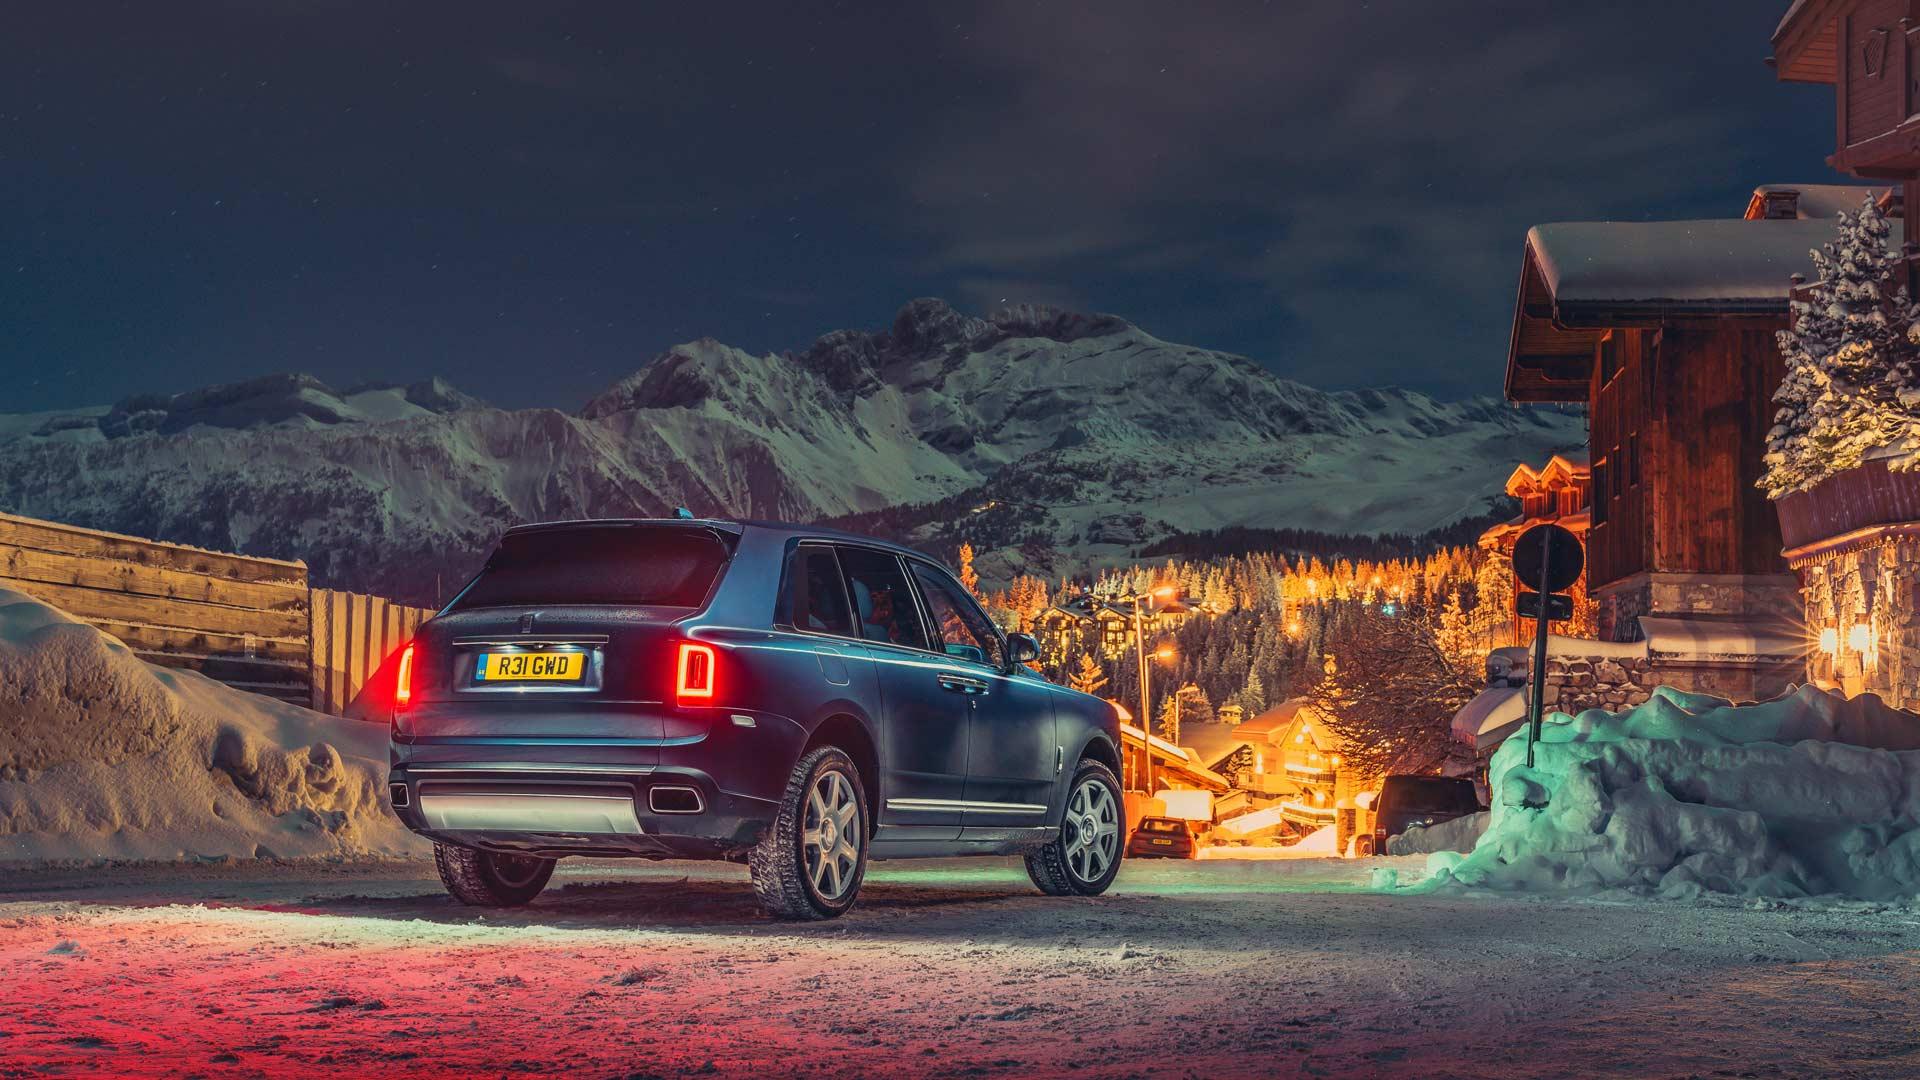 Rolls-Royce Cullinan Courchevel 1850 ski resort